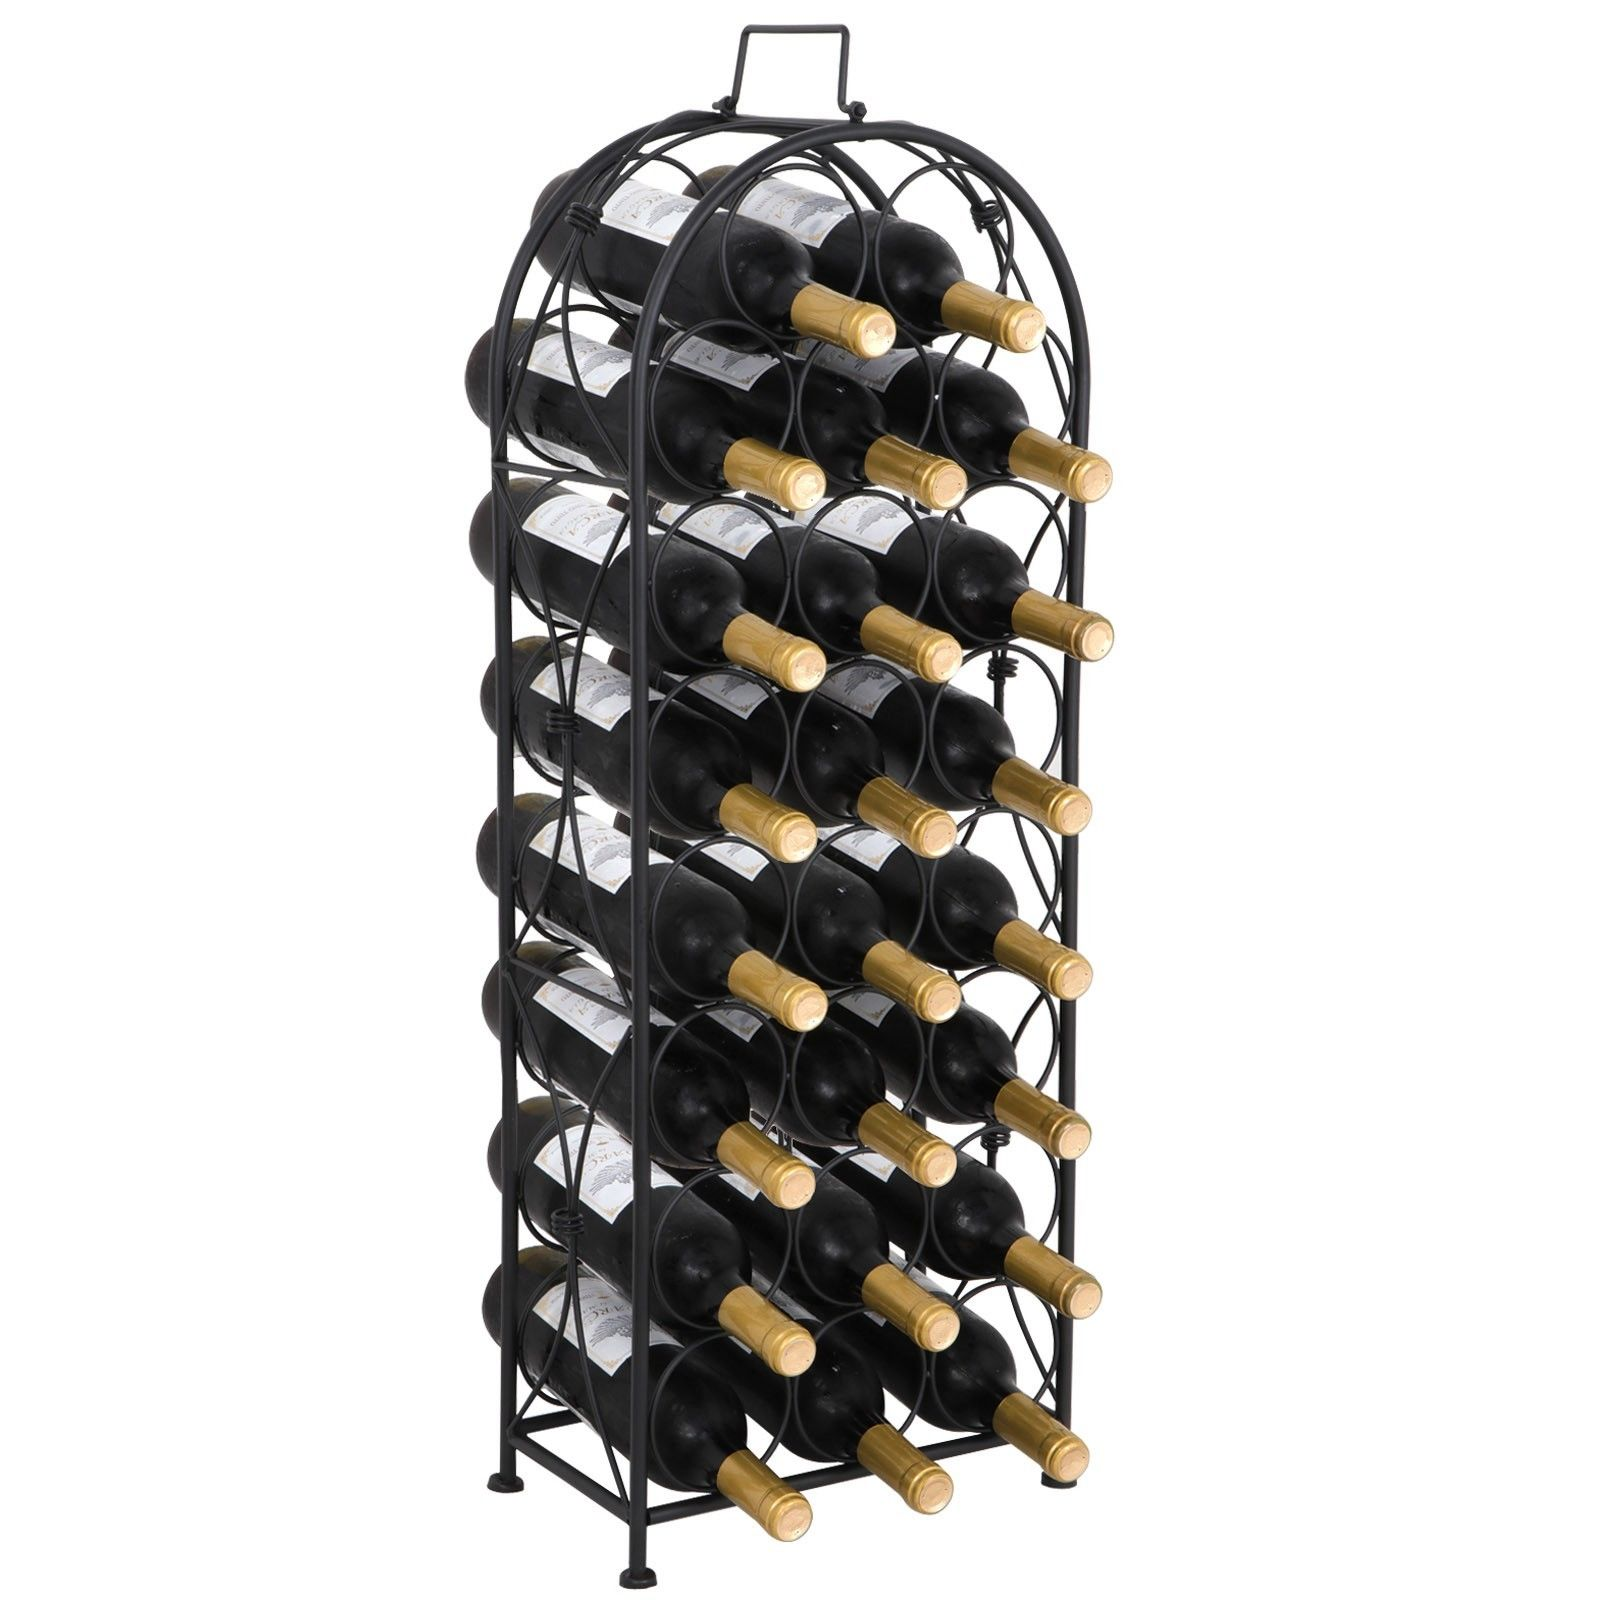 Zeny Black 23 Bottle Wine Rack Arched Top Free Standing Floor Wine Storage Rack Display Shelves